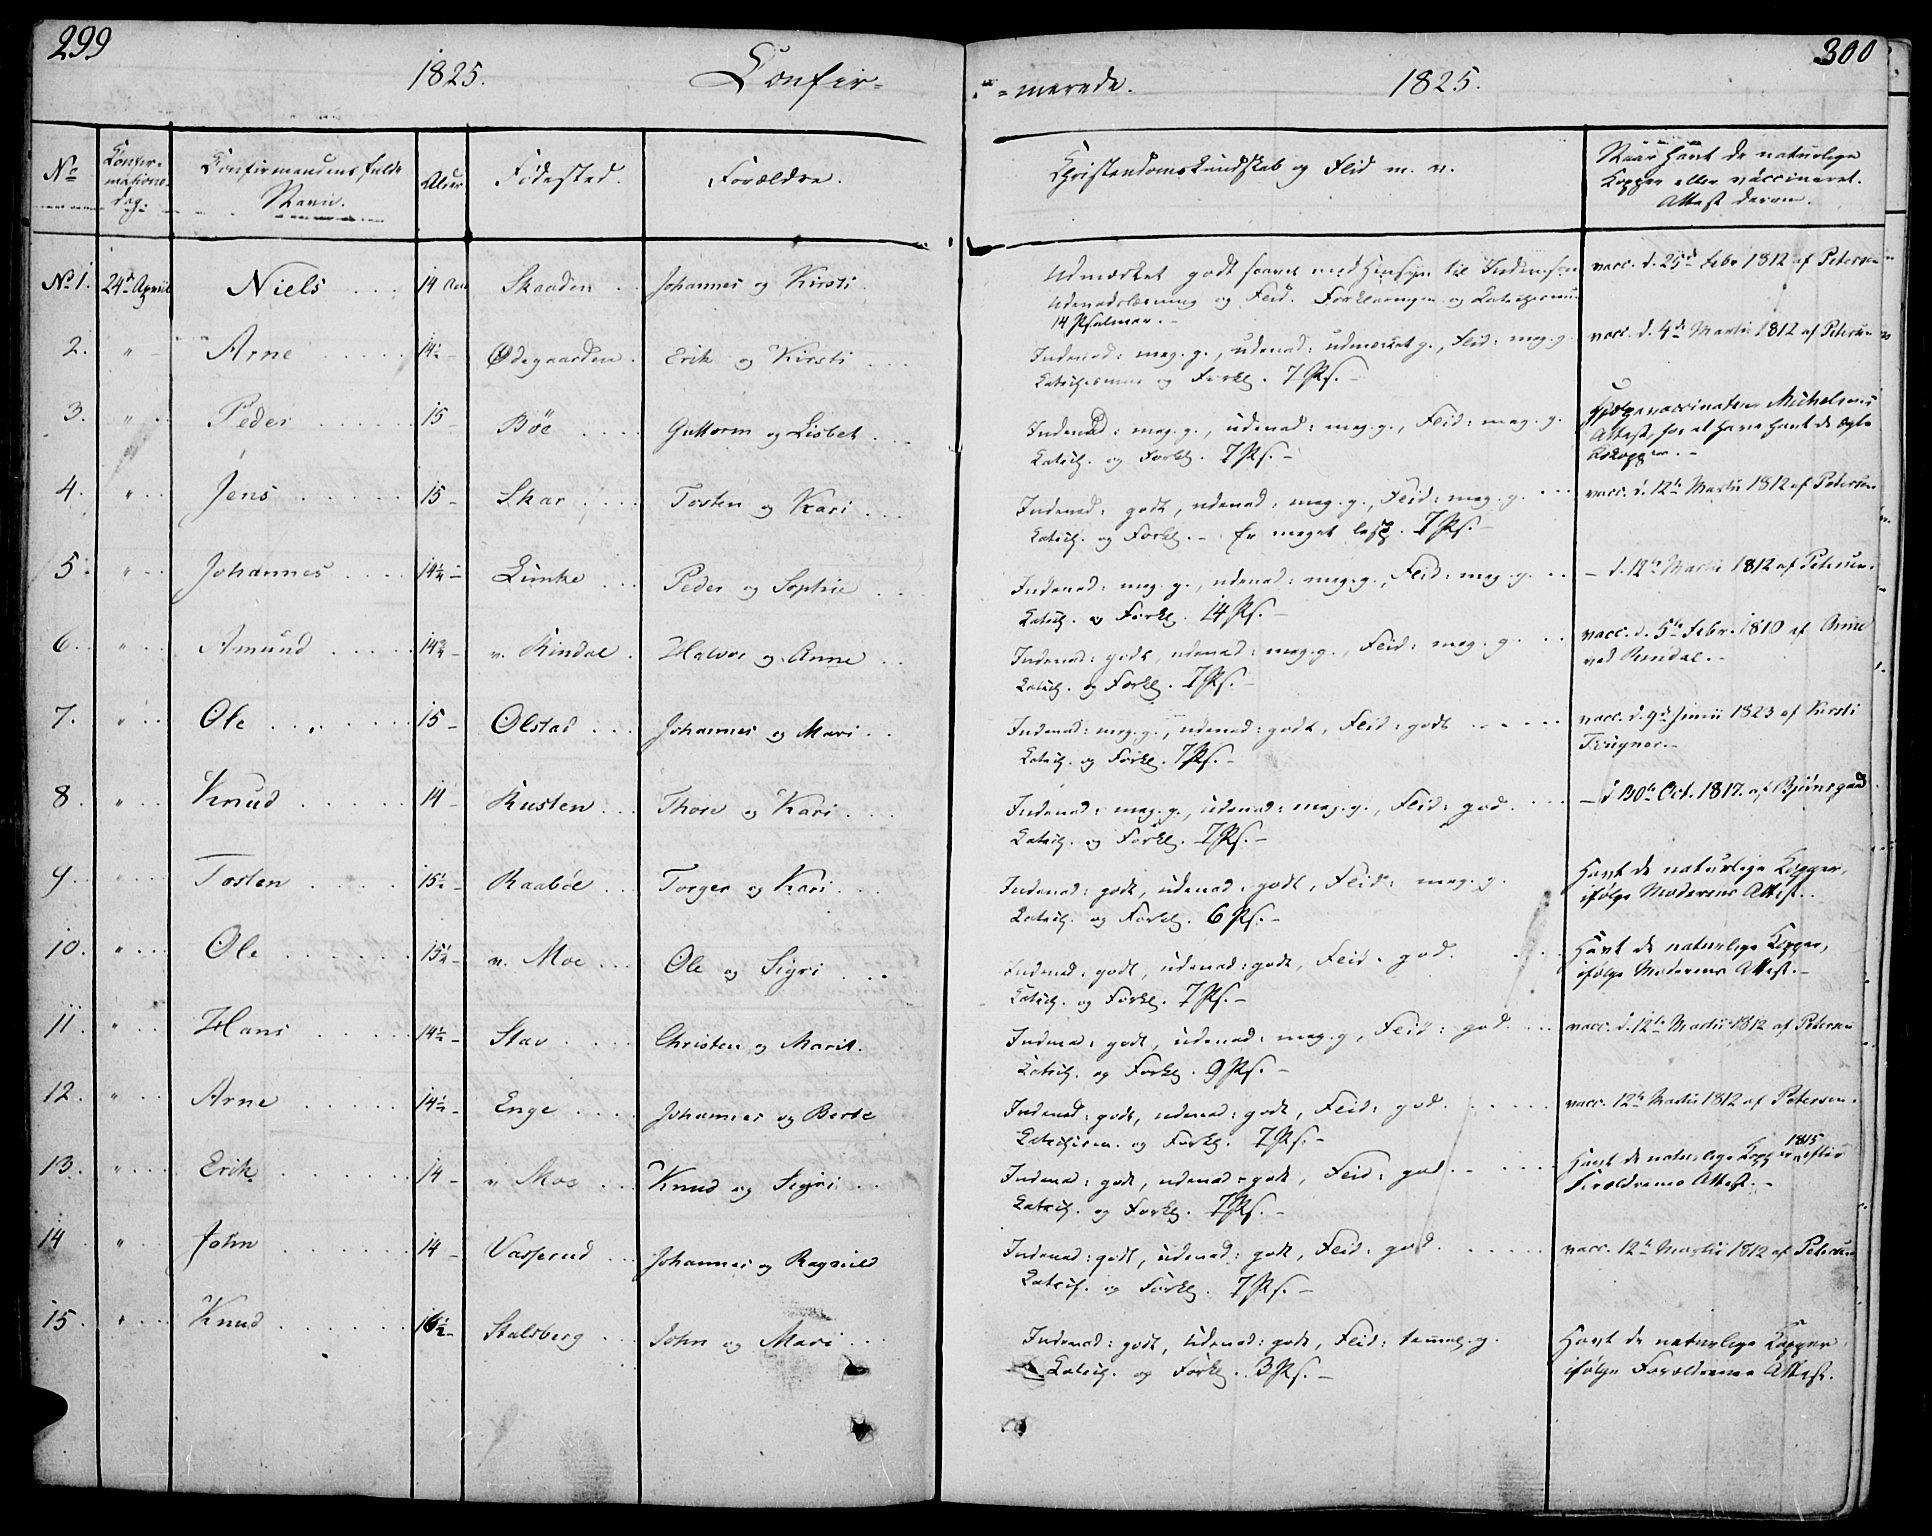 SAH, Øyer prestekontor, Ministerialbok nr. 4, 1824-1841, s. 299-300